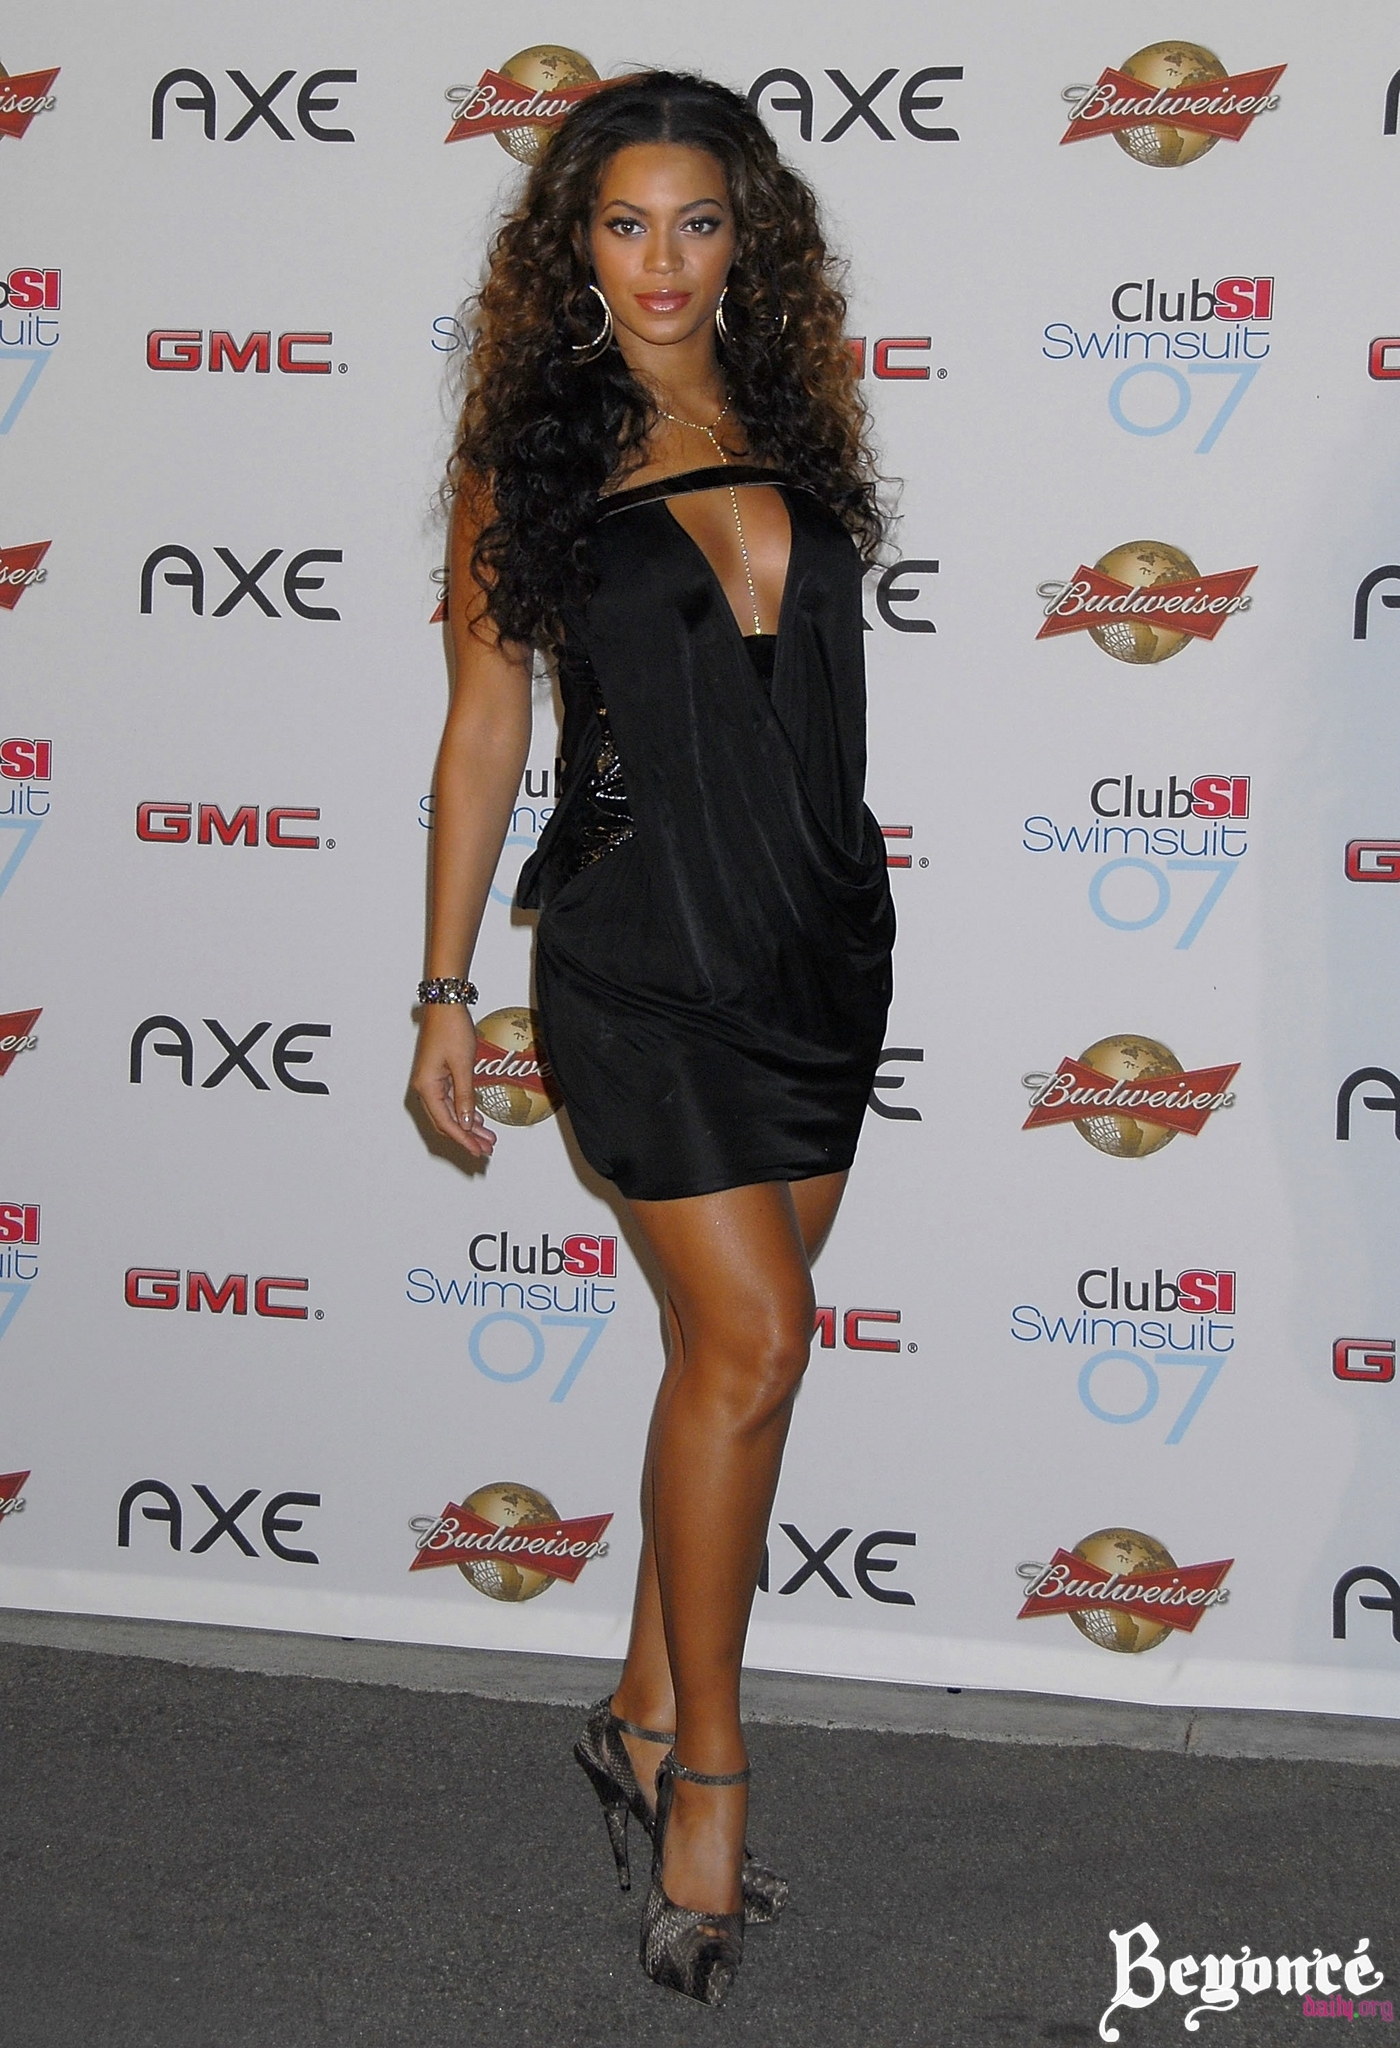 Beyonce S Best Short Dress Poll Results Beyonce Fanpop